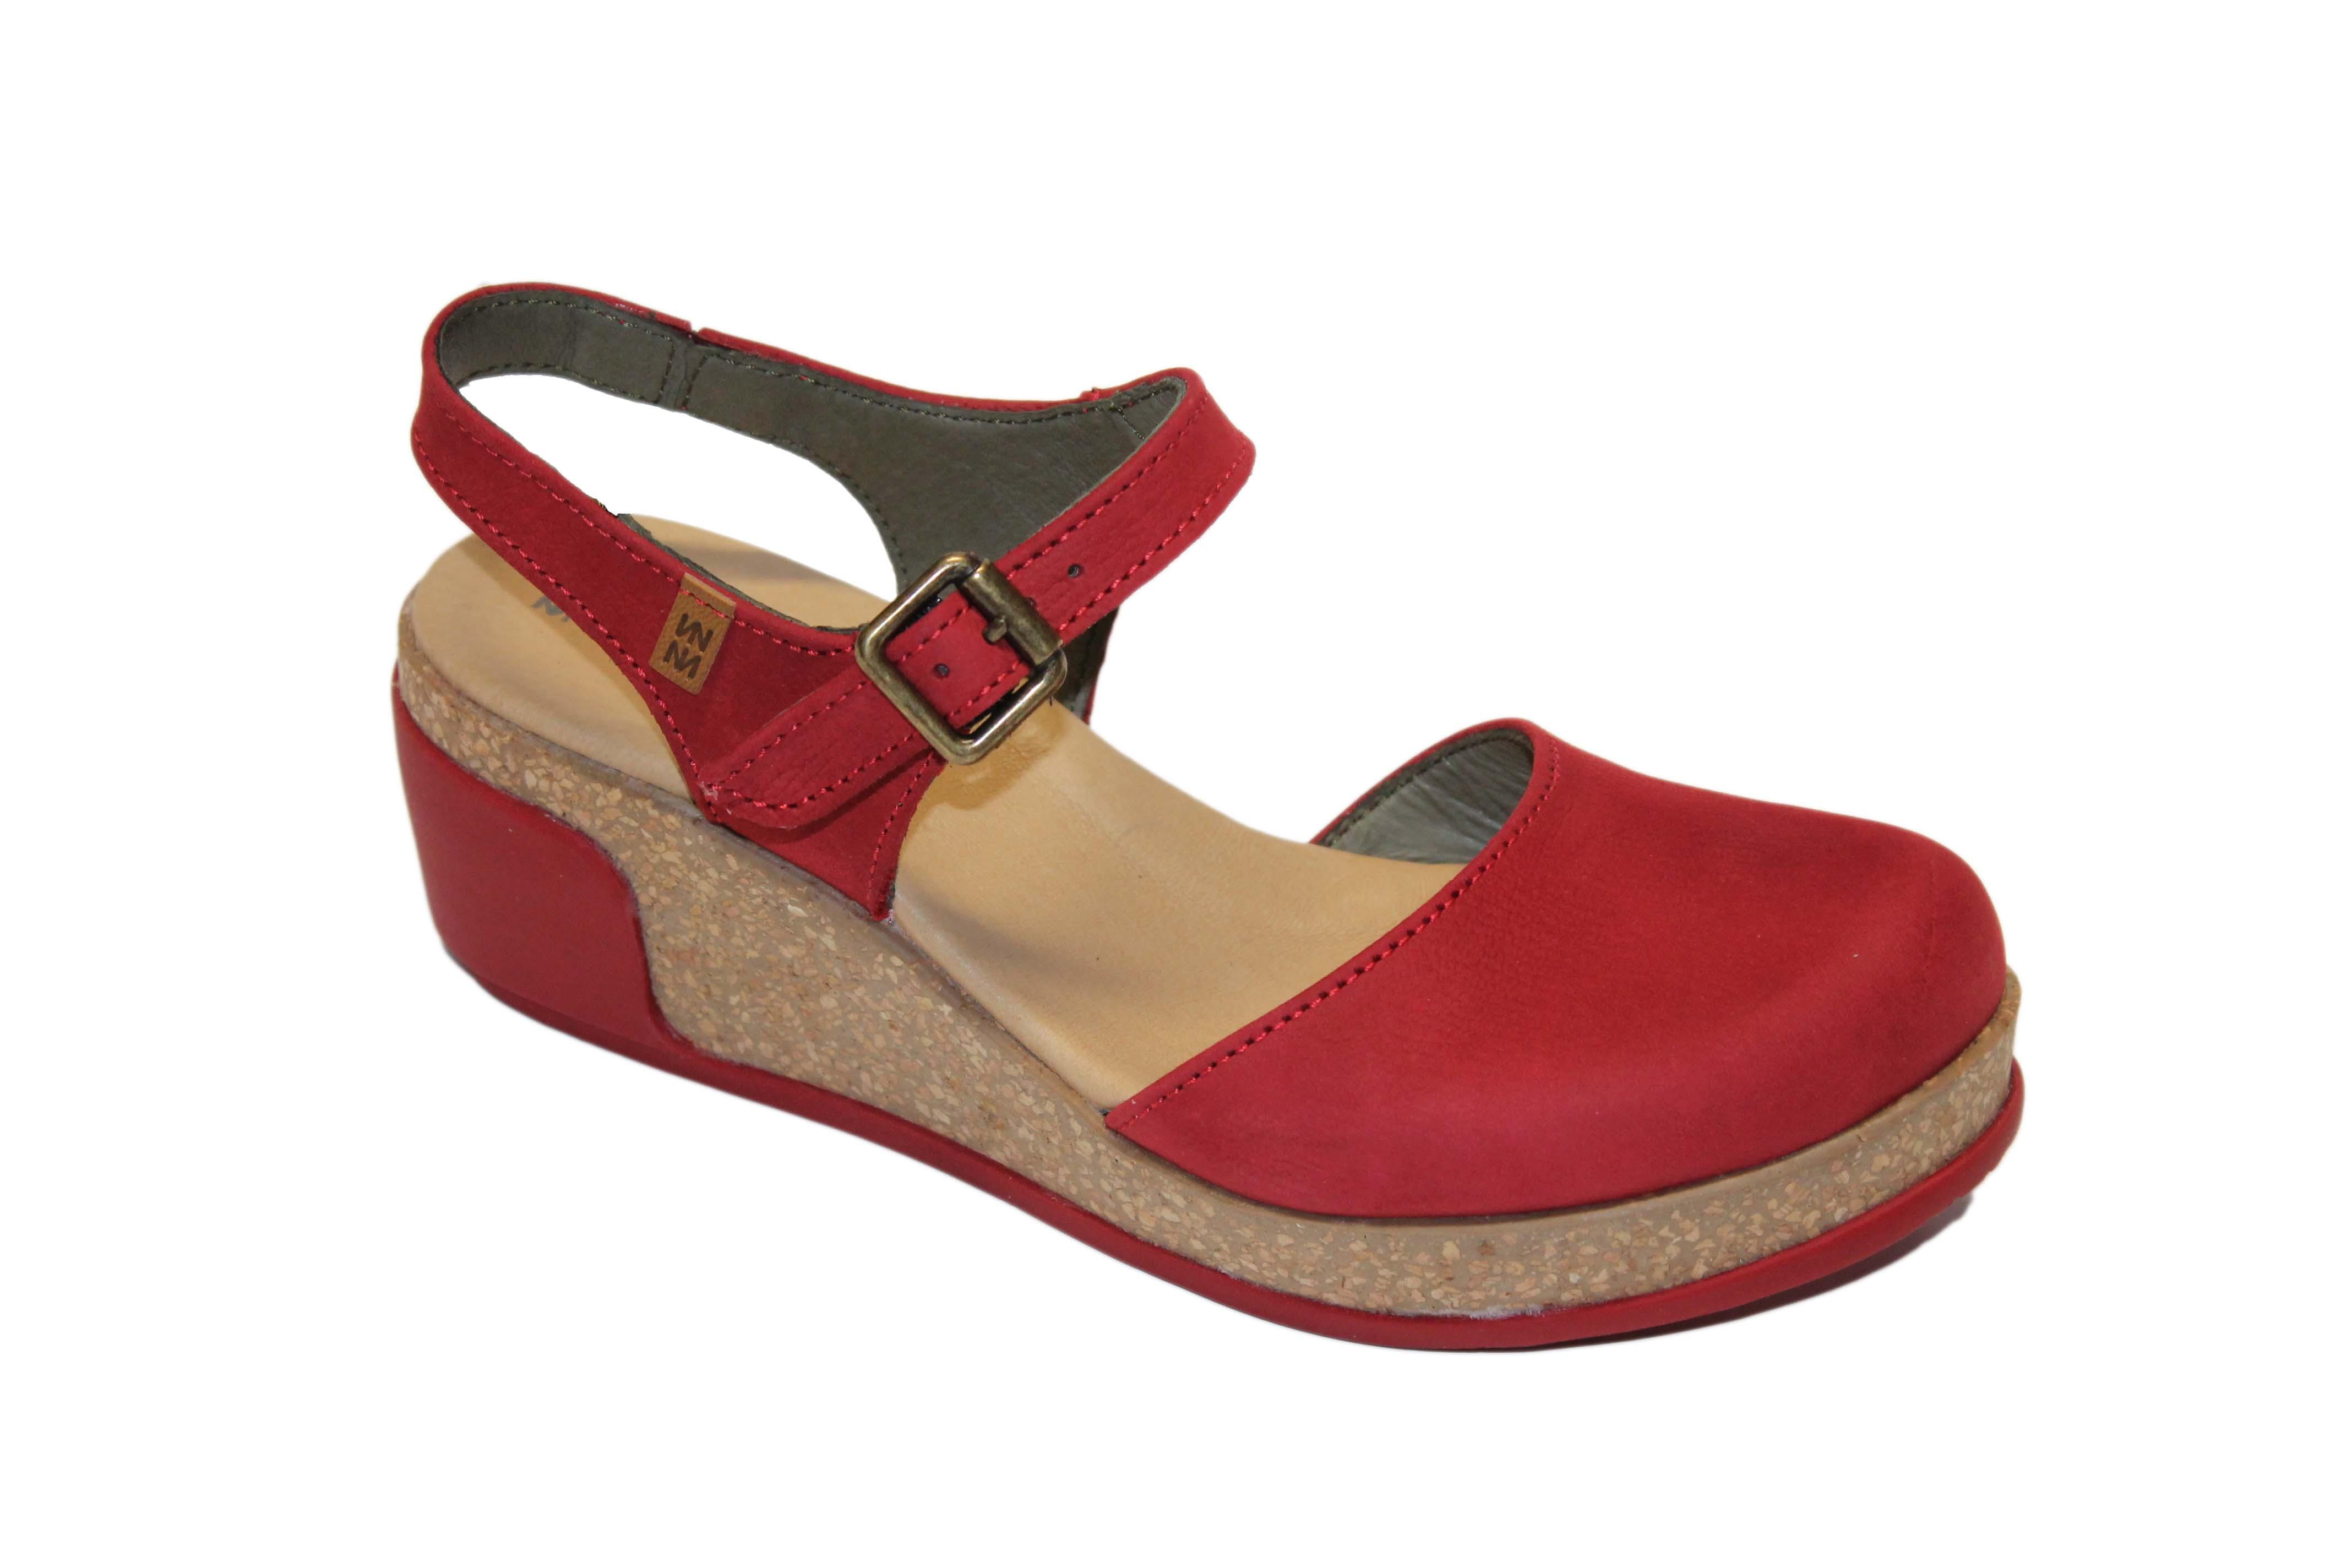 Sandalo 5cm In 0xnnokp8w Zeppa Chiuso 5001 Naturalista Punta El TuJ3lFK1c